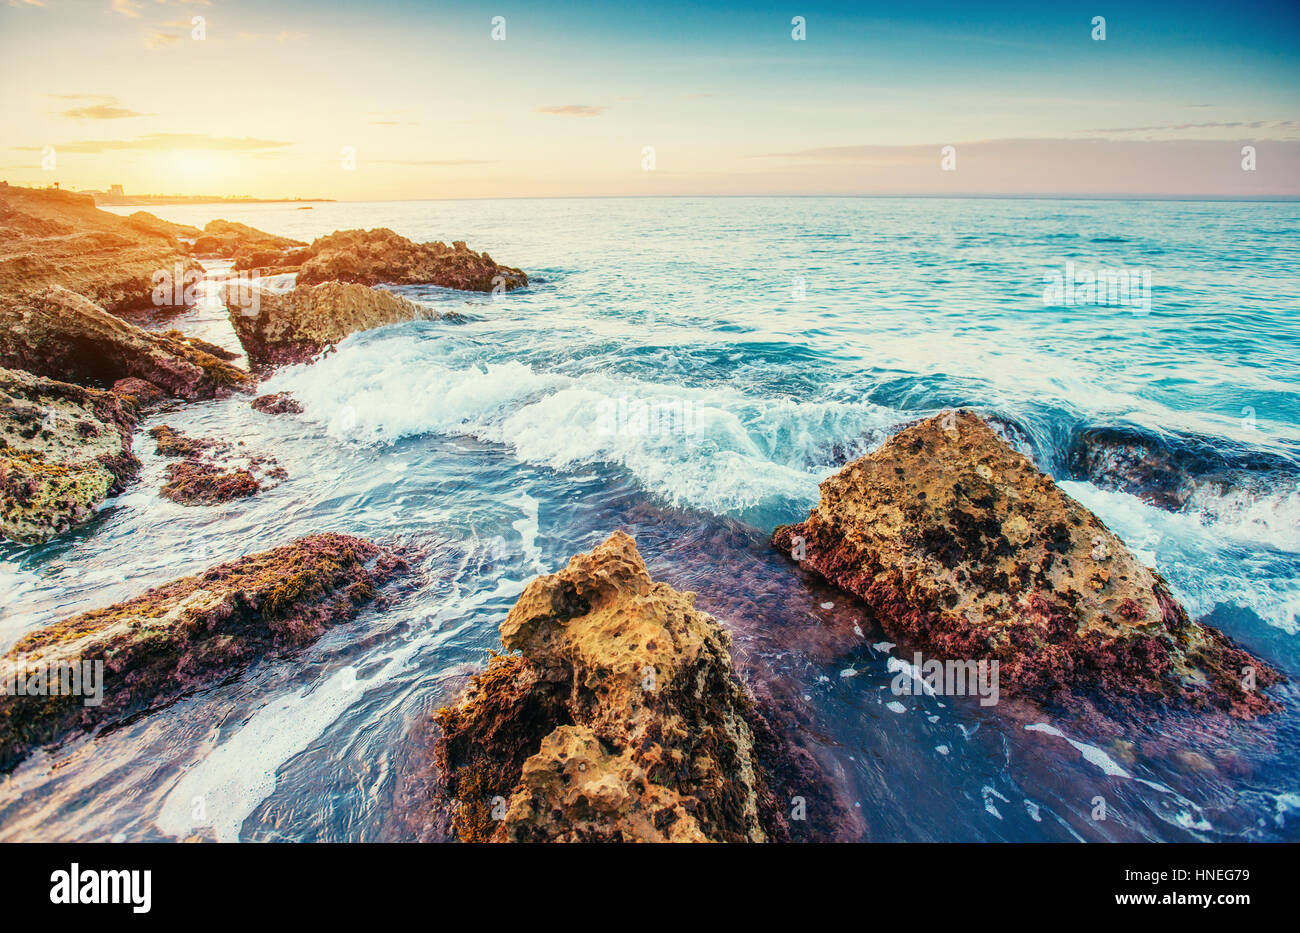 Pintoresca costa rocosa Cabo Milazzo. Sicilia, Italia Imagen De Stock